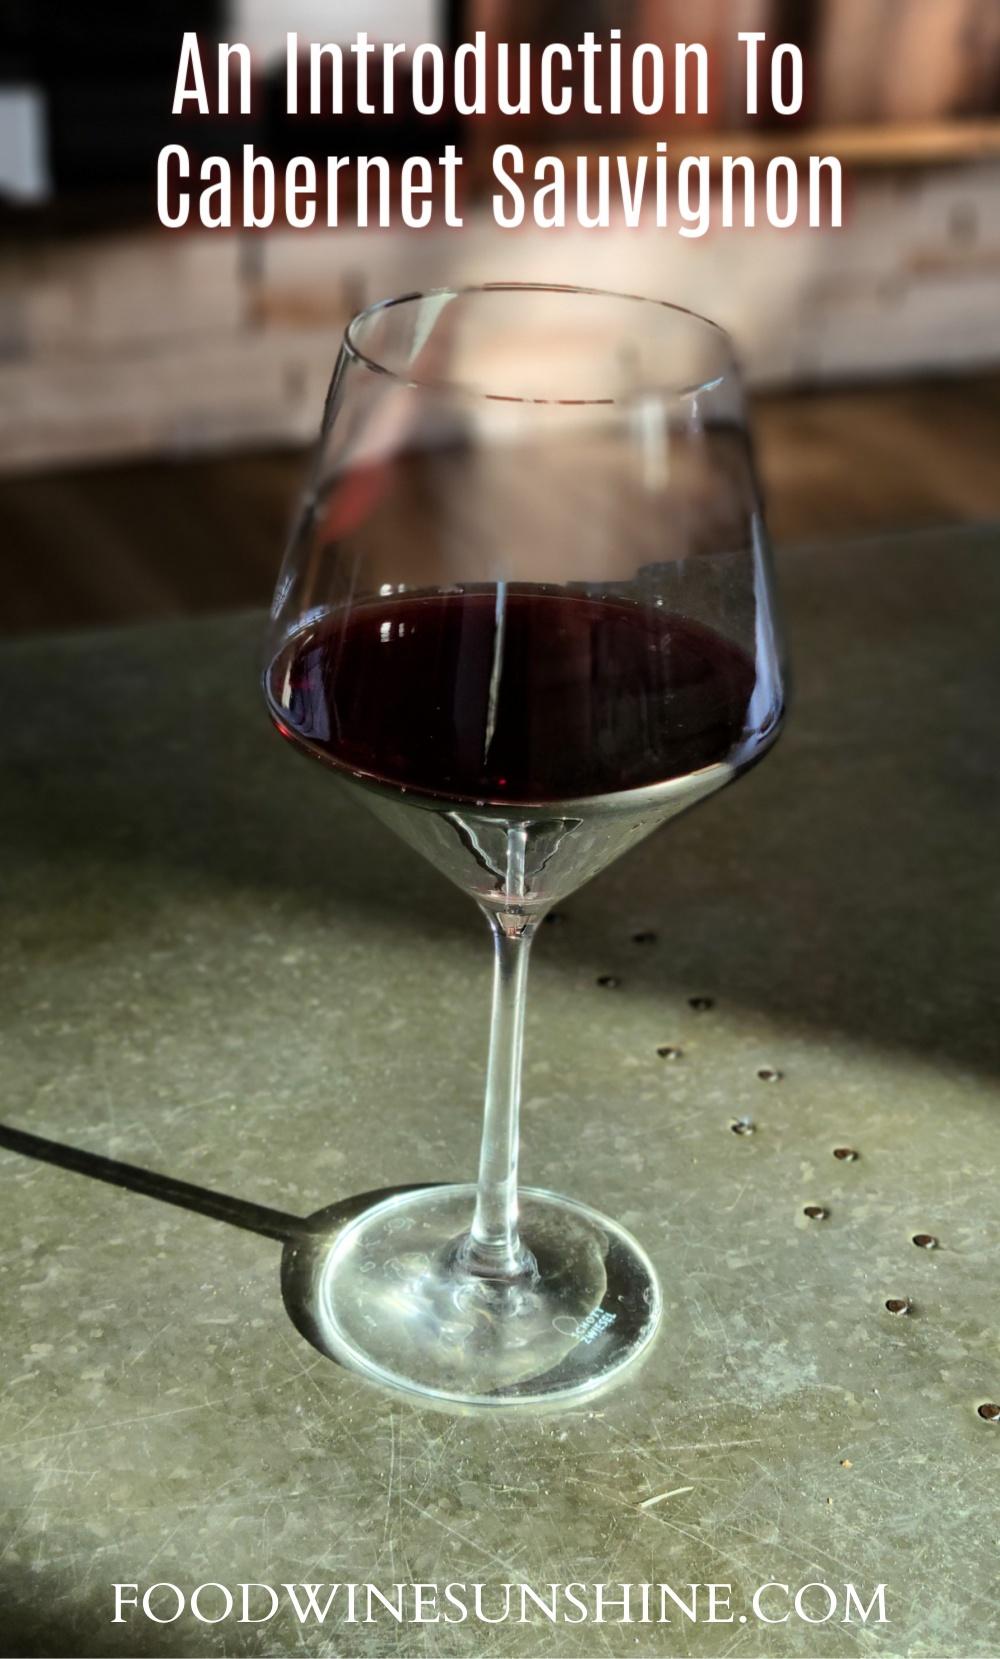 An Introduction To Cabernet Sauvignon